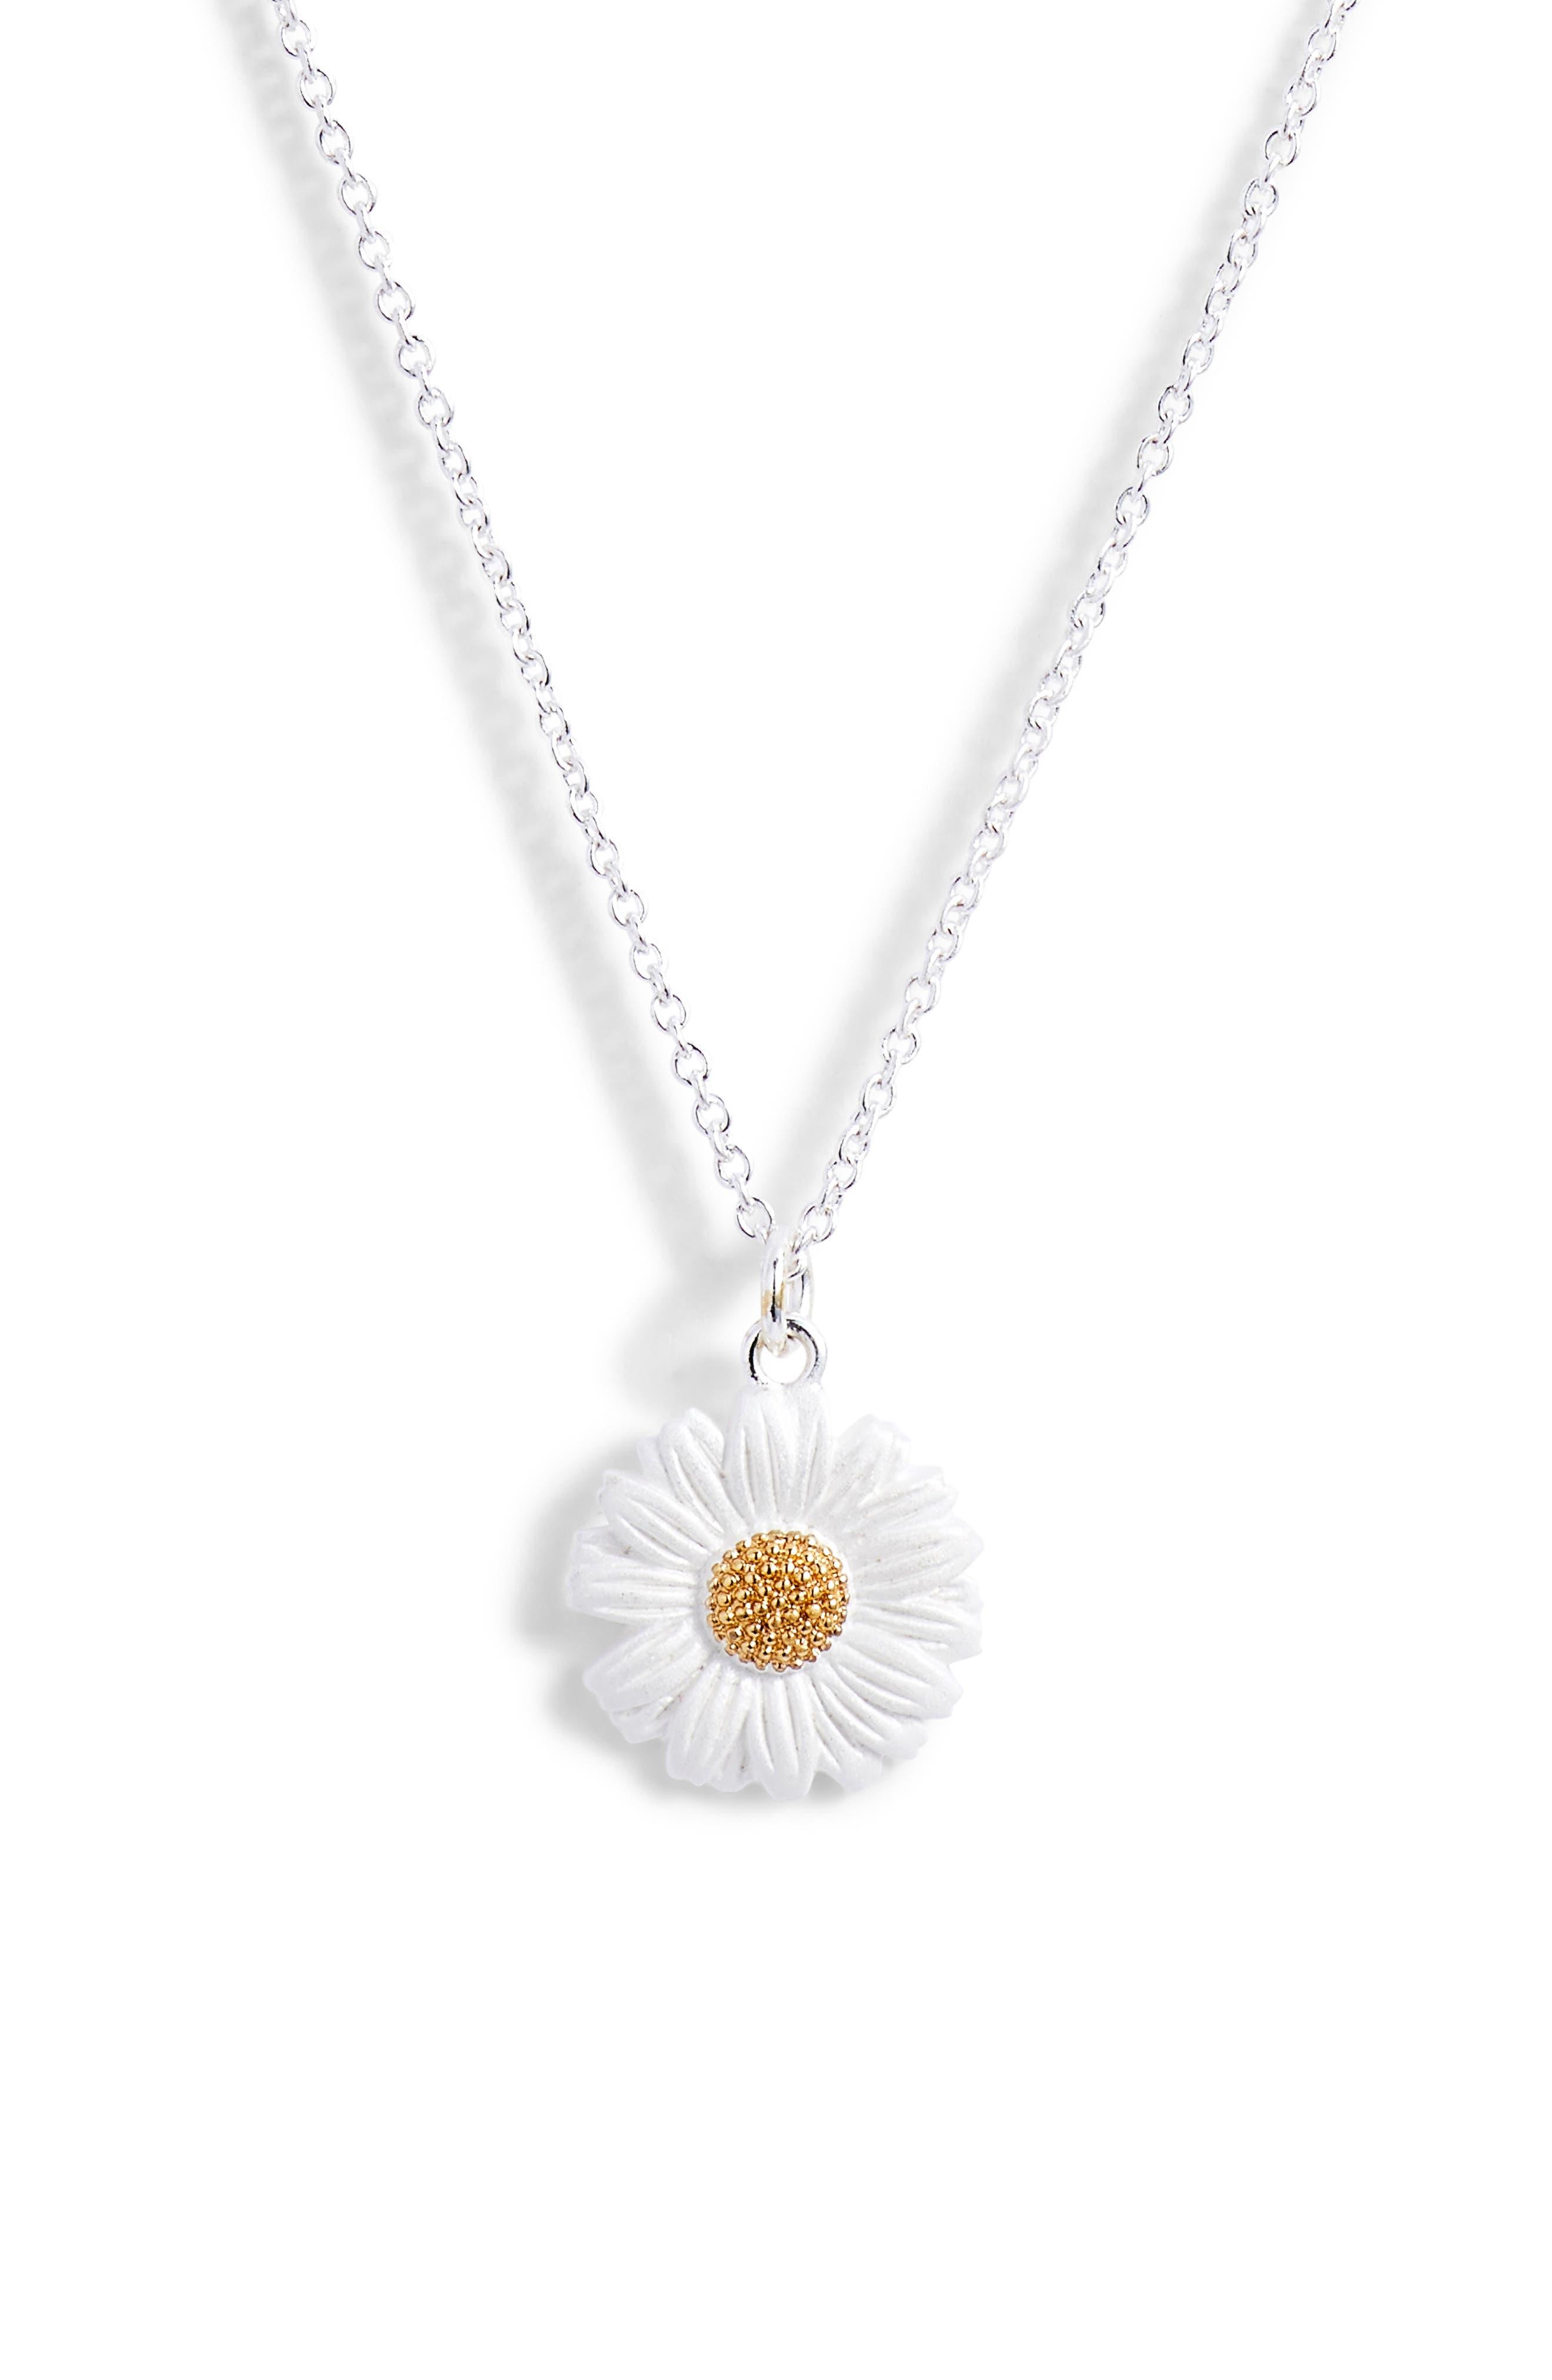 3D Daisy Pendant Necklace,                             Main thumbnail 1, color,                             Silver/ Gold